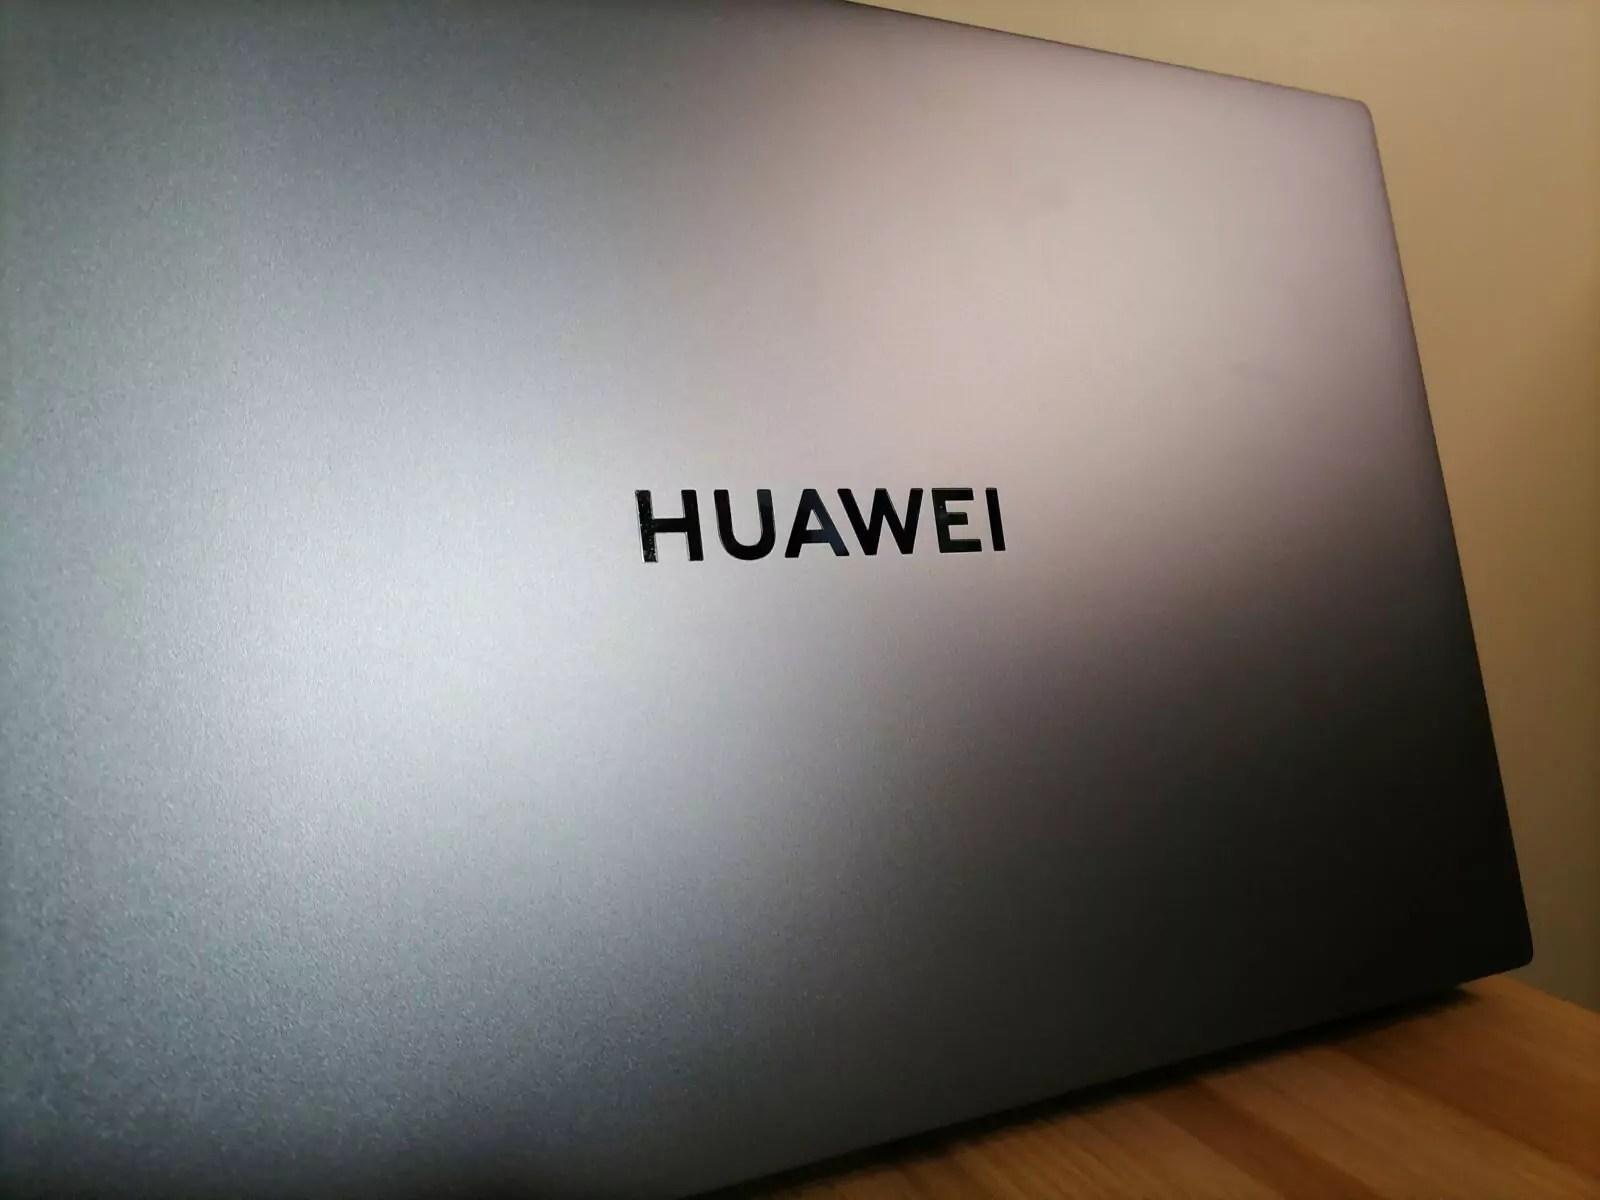 Huawei MateBook D16 arrière 1